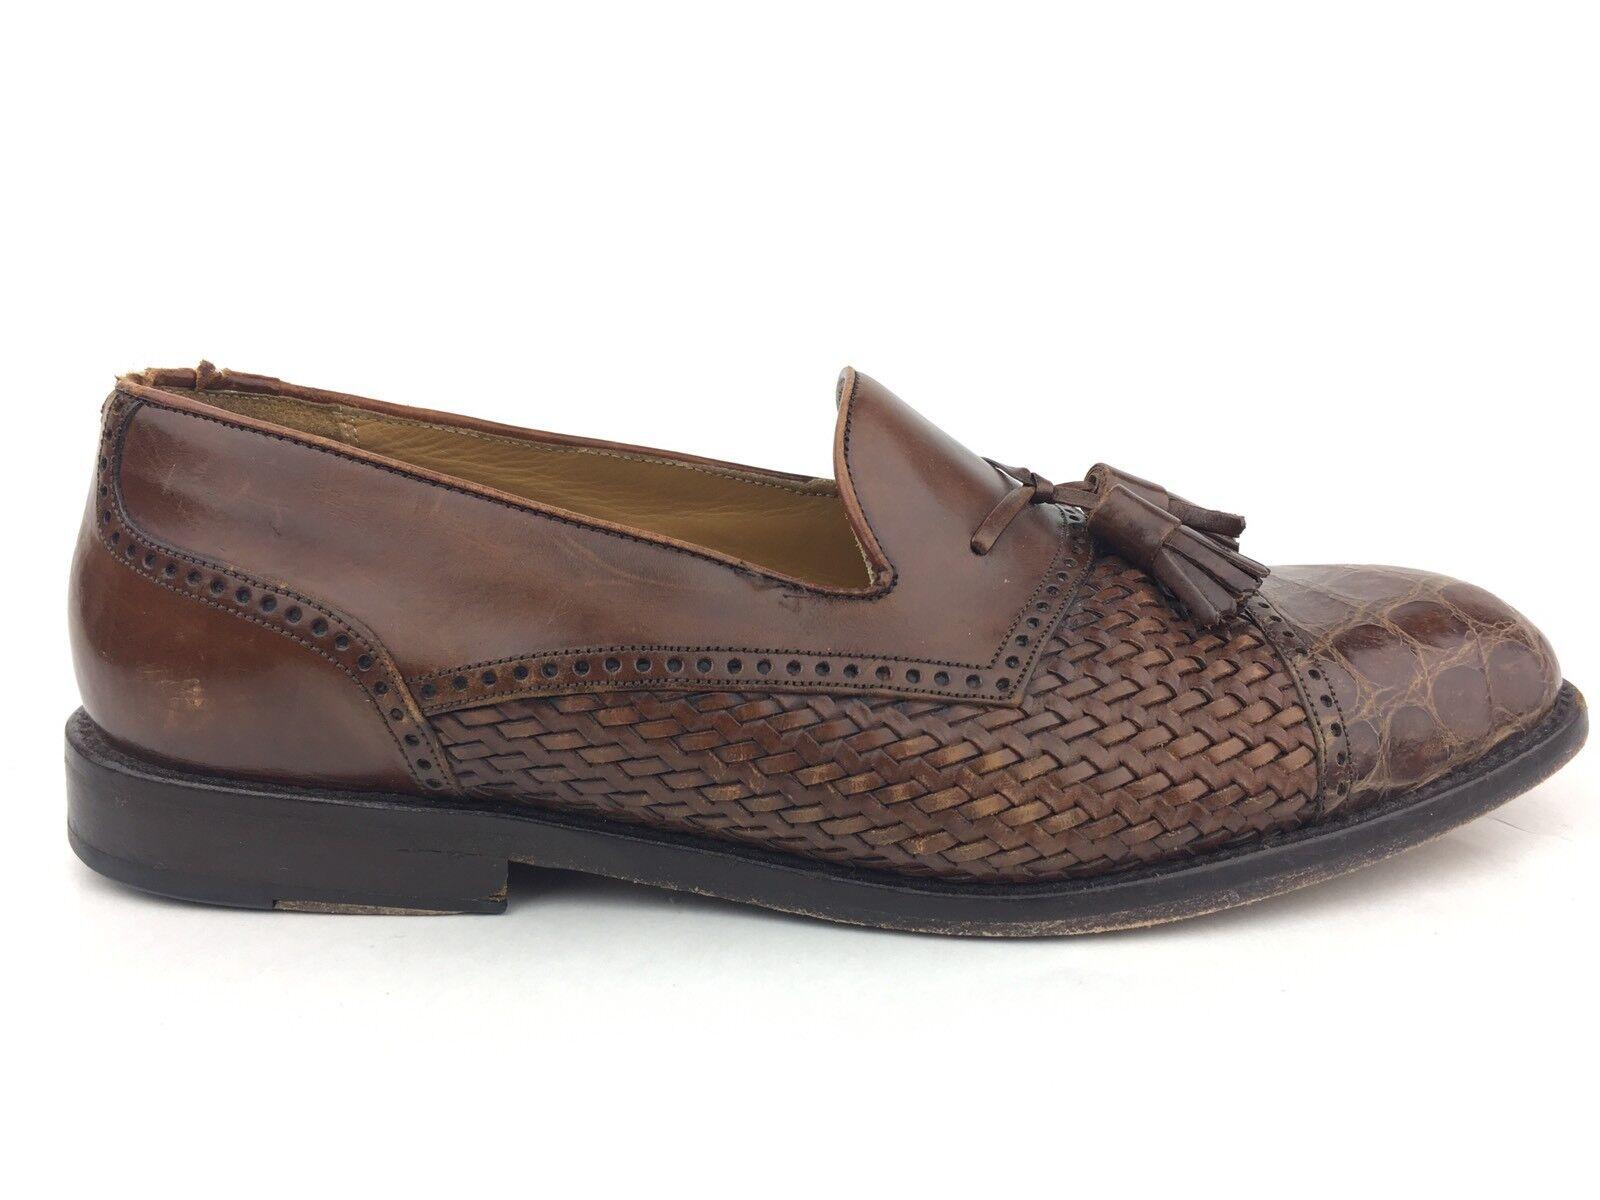 Mezlan Carmel 9W shoes, Genuine Crocodile, Mens Tassel Loafers, Made in Spain